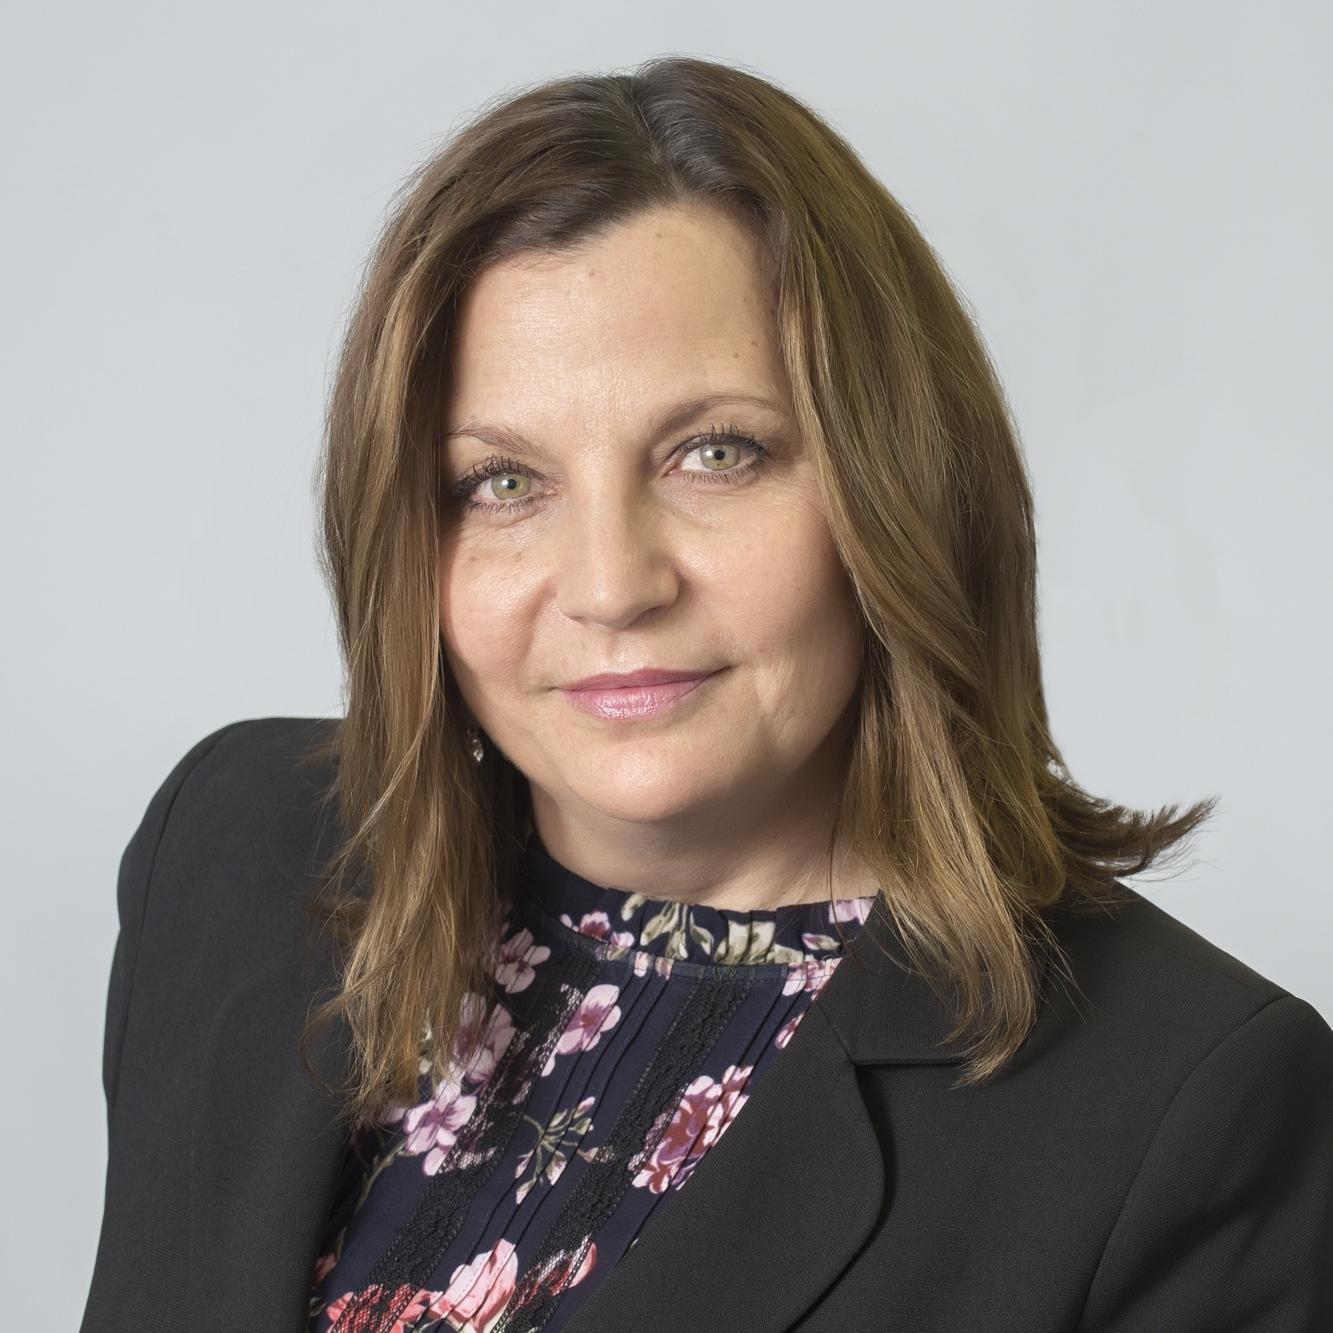 Pam Berretta MHA, CBIS, CTRS Director of Client Services